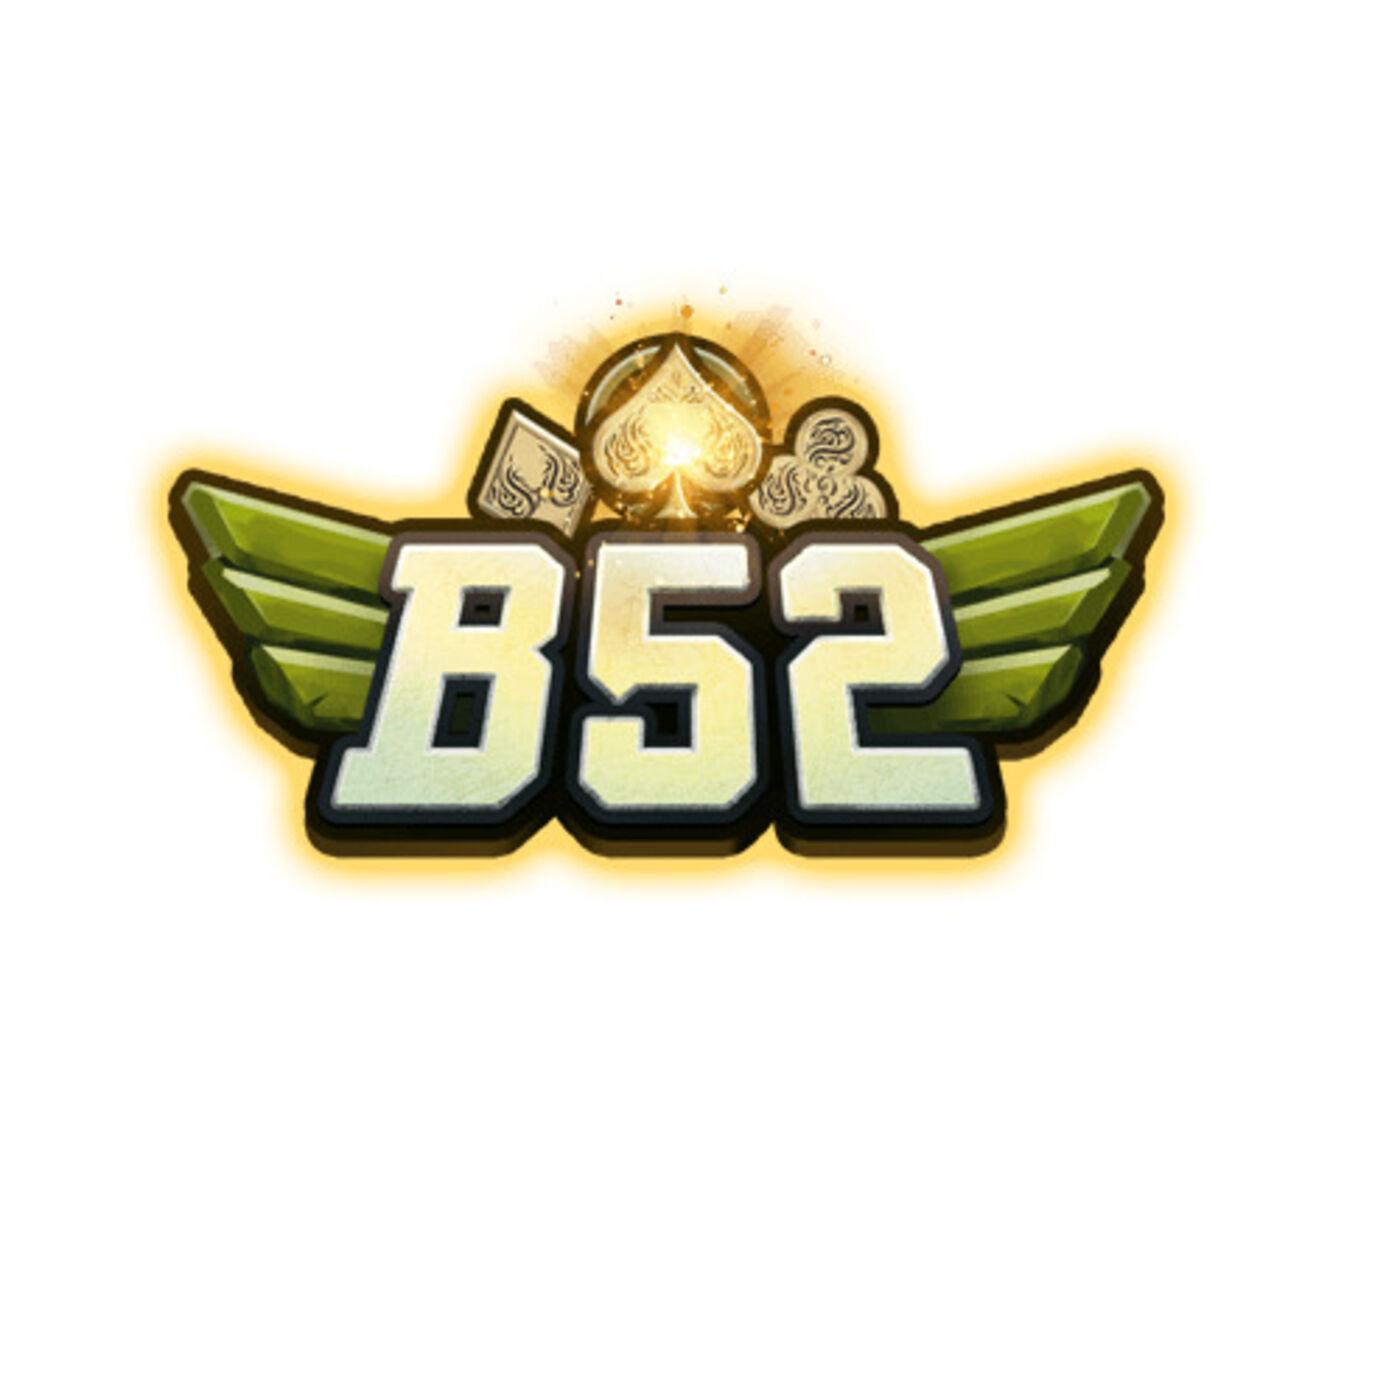 Game bai B52 uy tin so 1 VN - GameB52.club